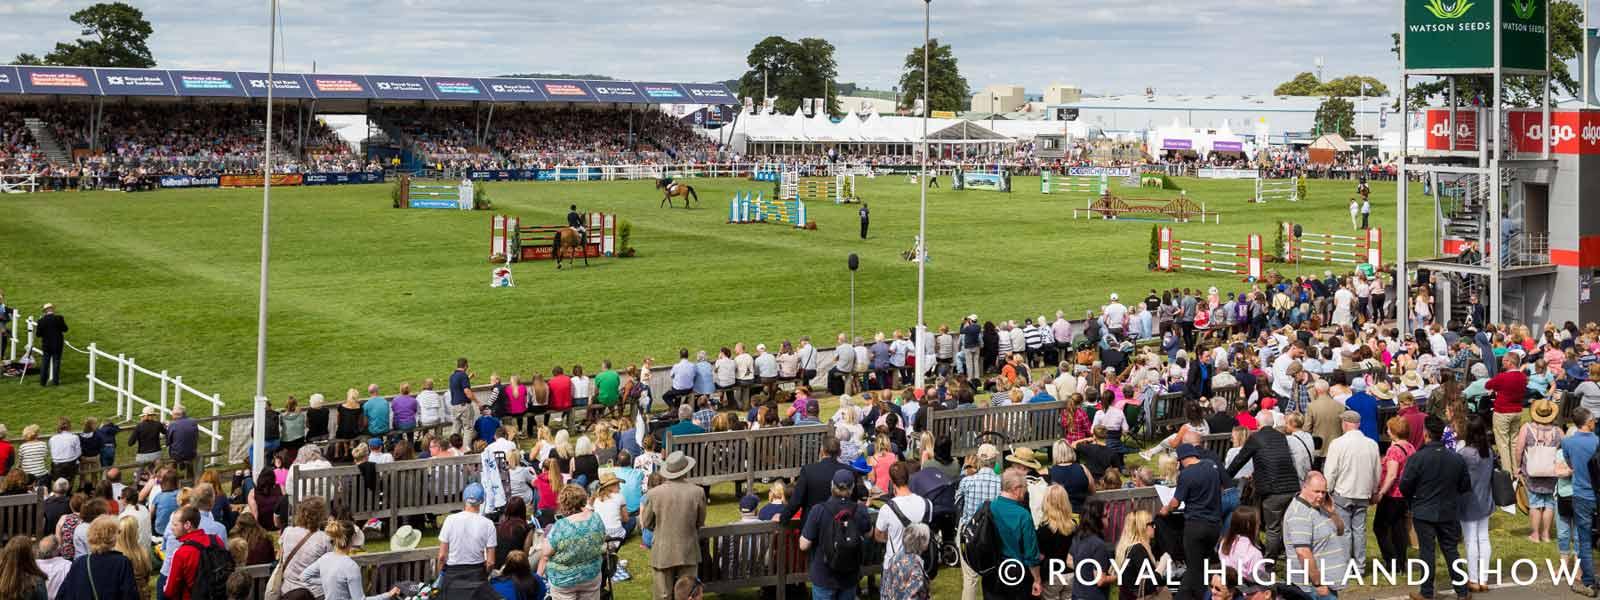 Main Ring at the Royal Highland Show in Scotland